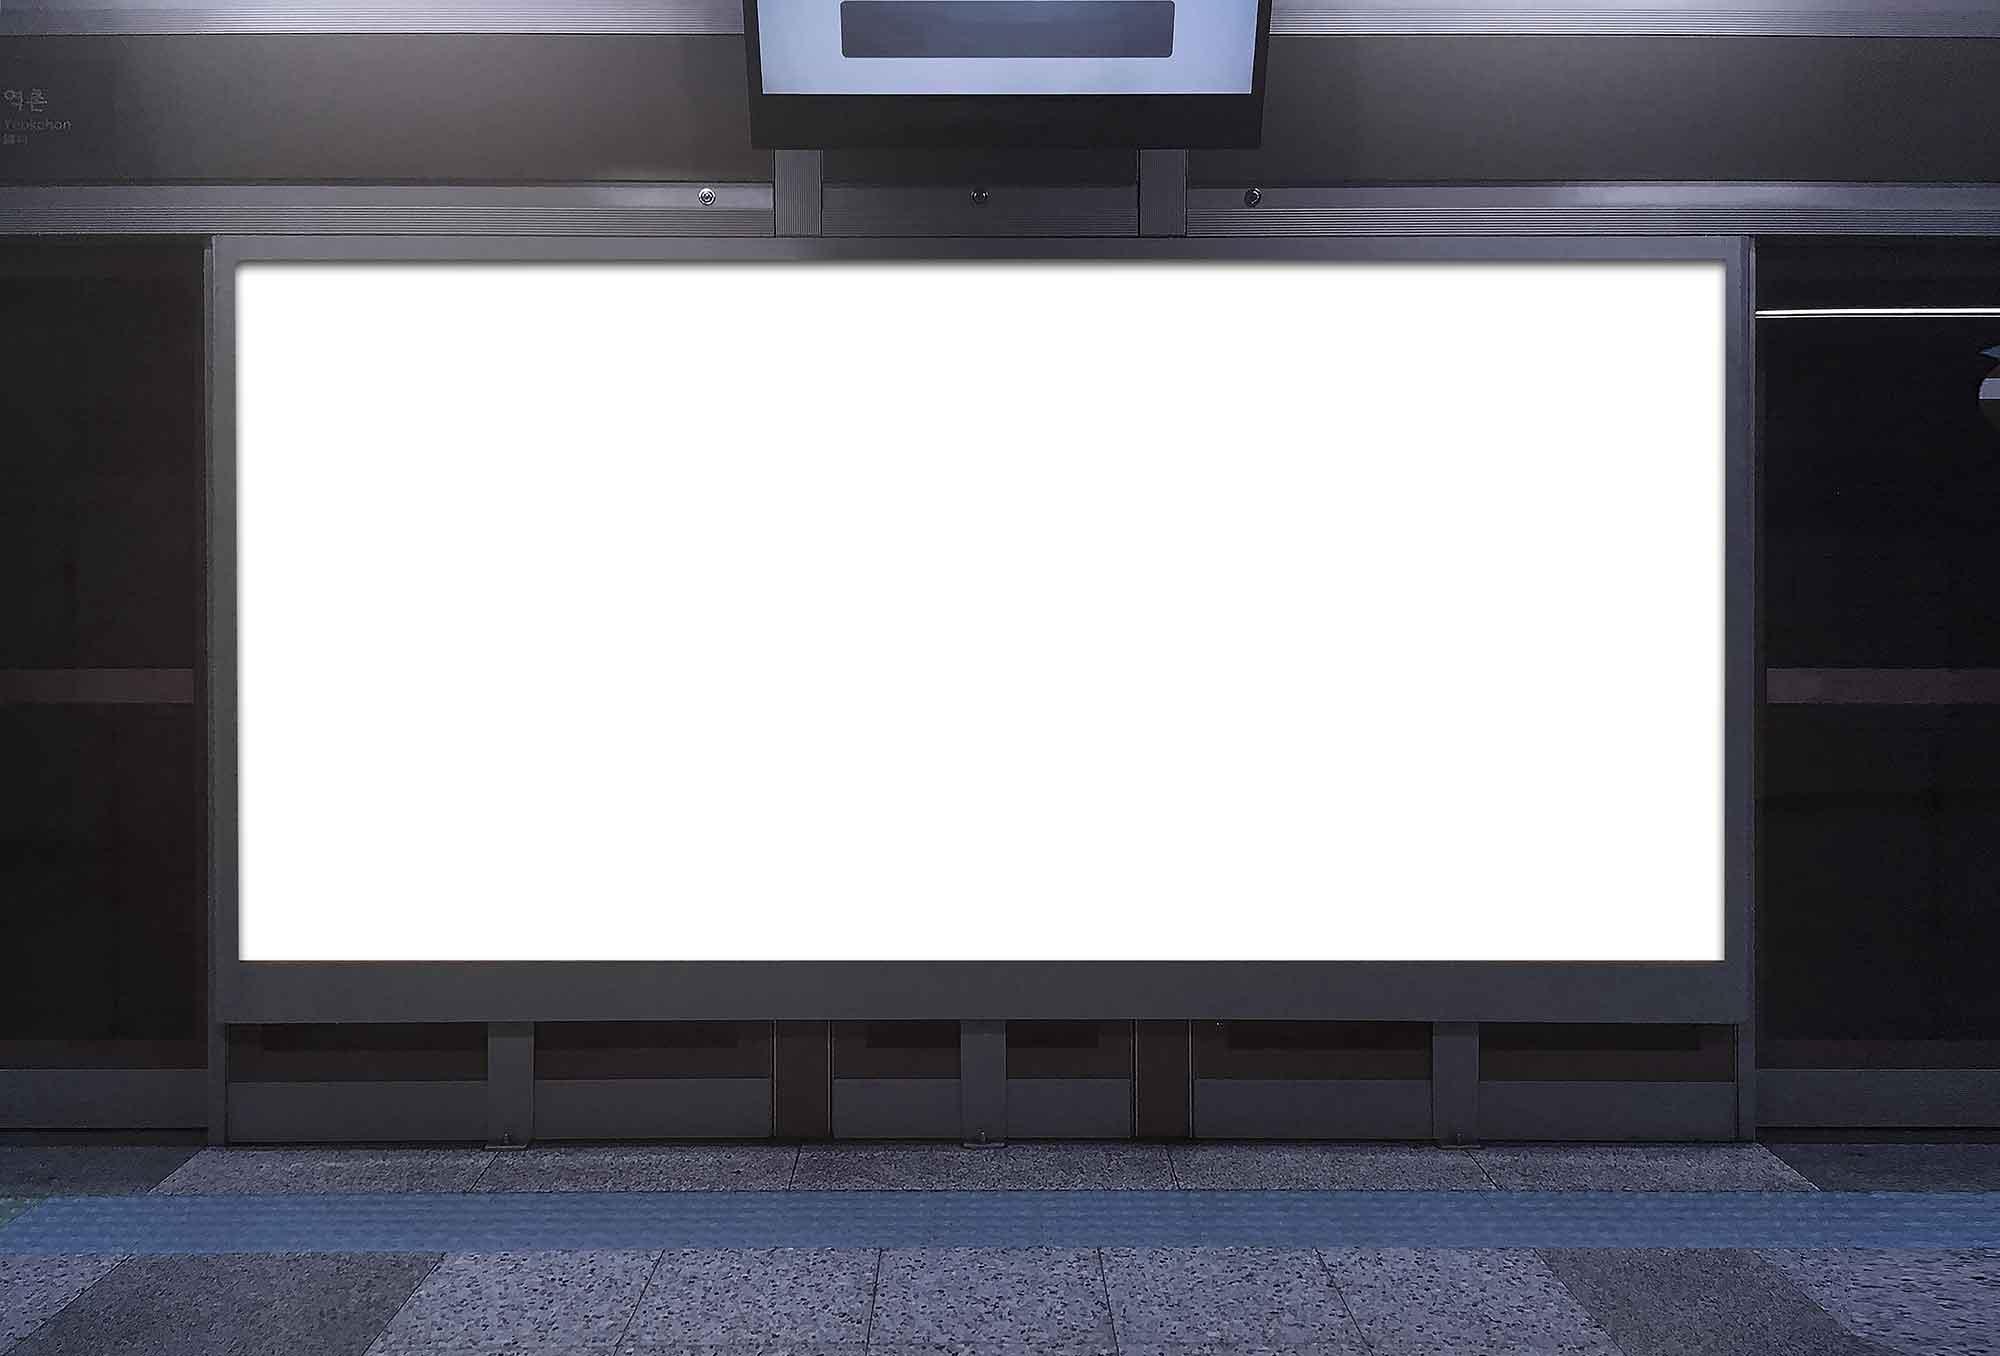 Advertising Subway Hoarding Mockup 2